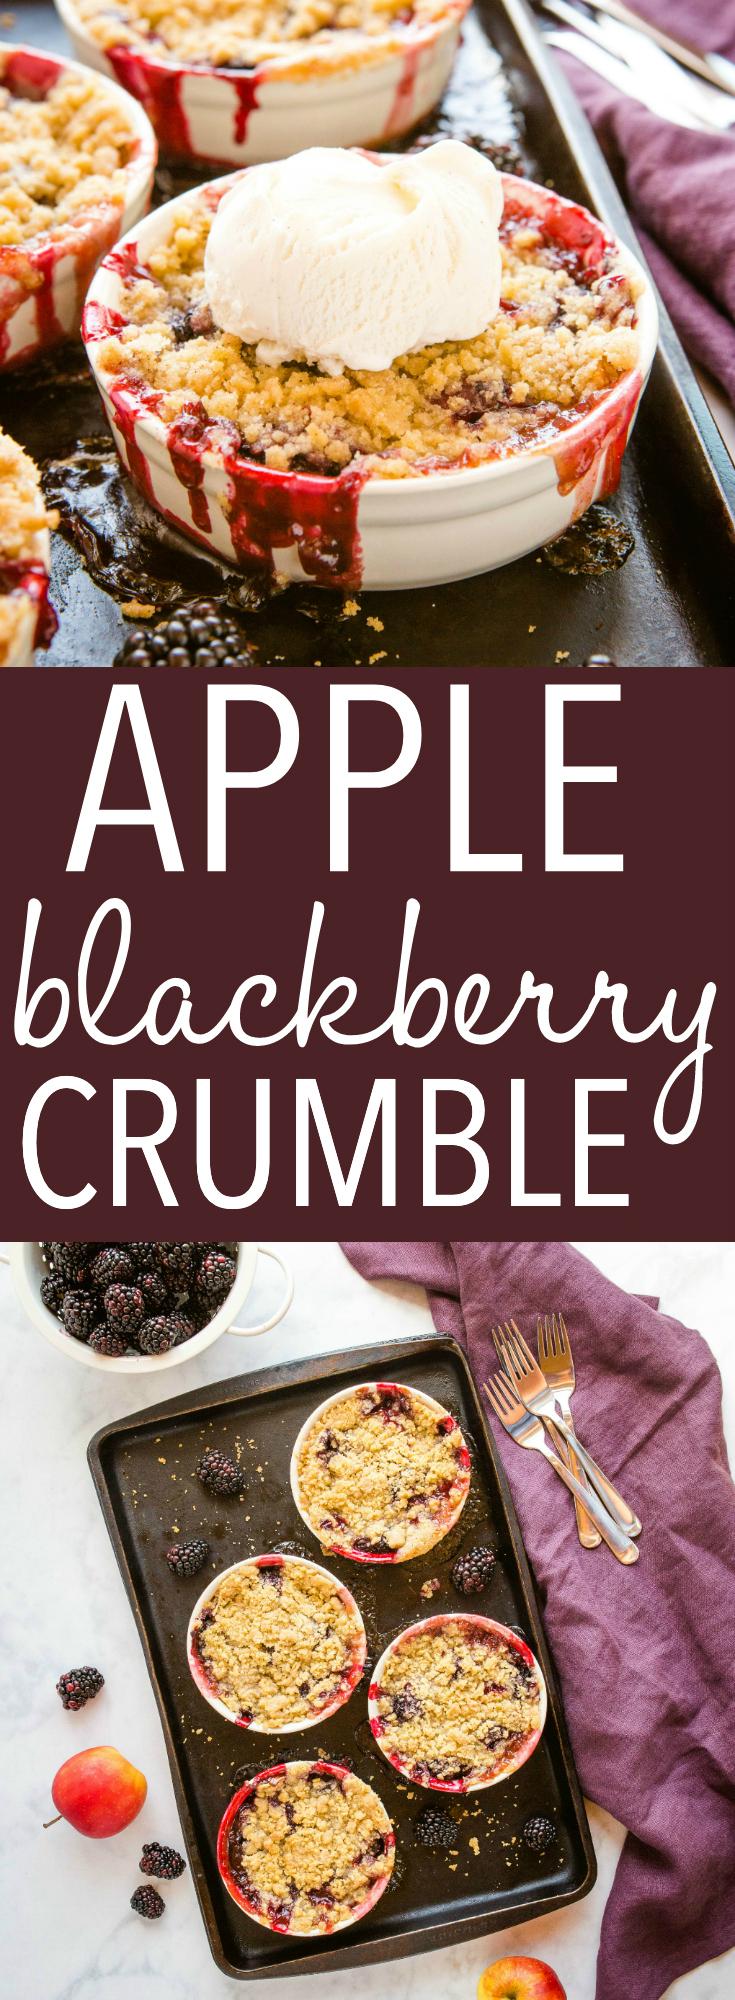 Apple Blackberry Crumble Pinterest